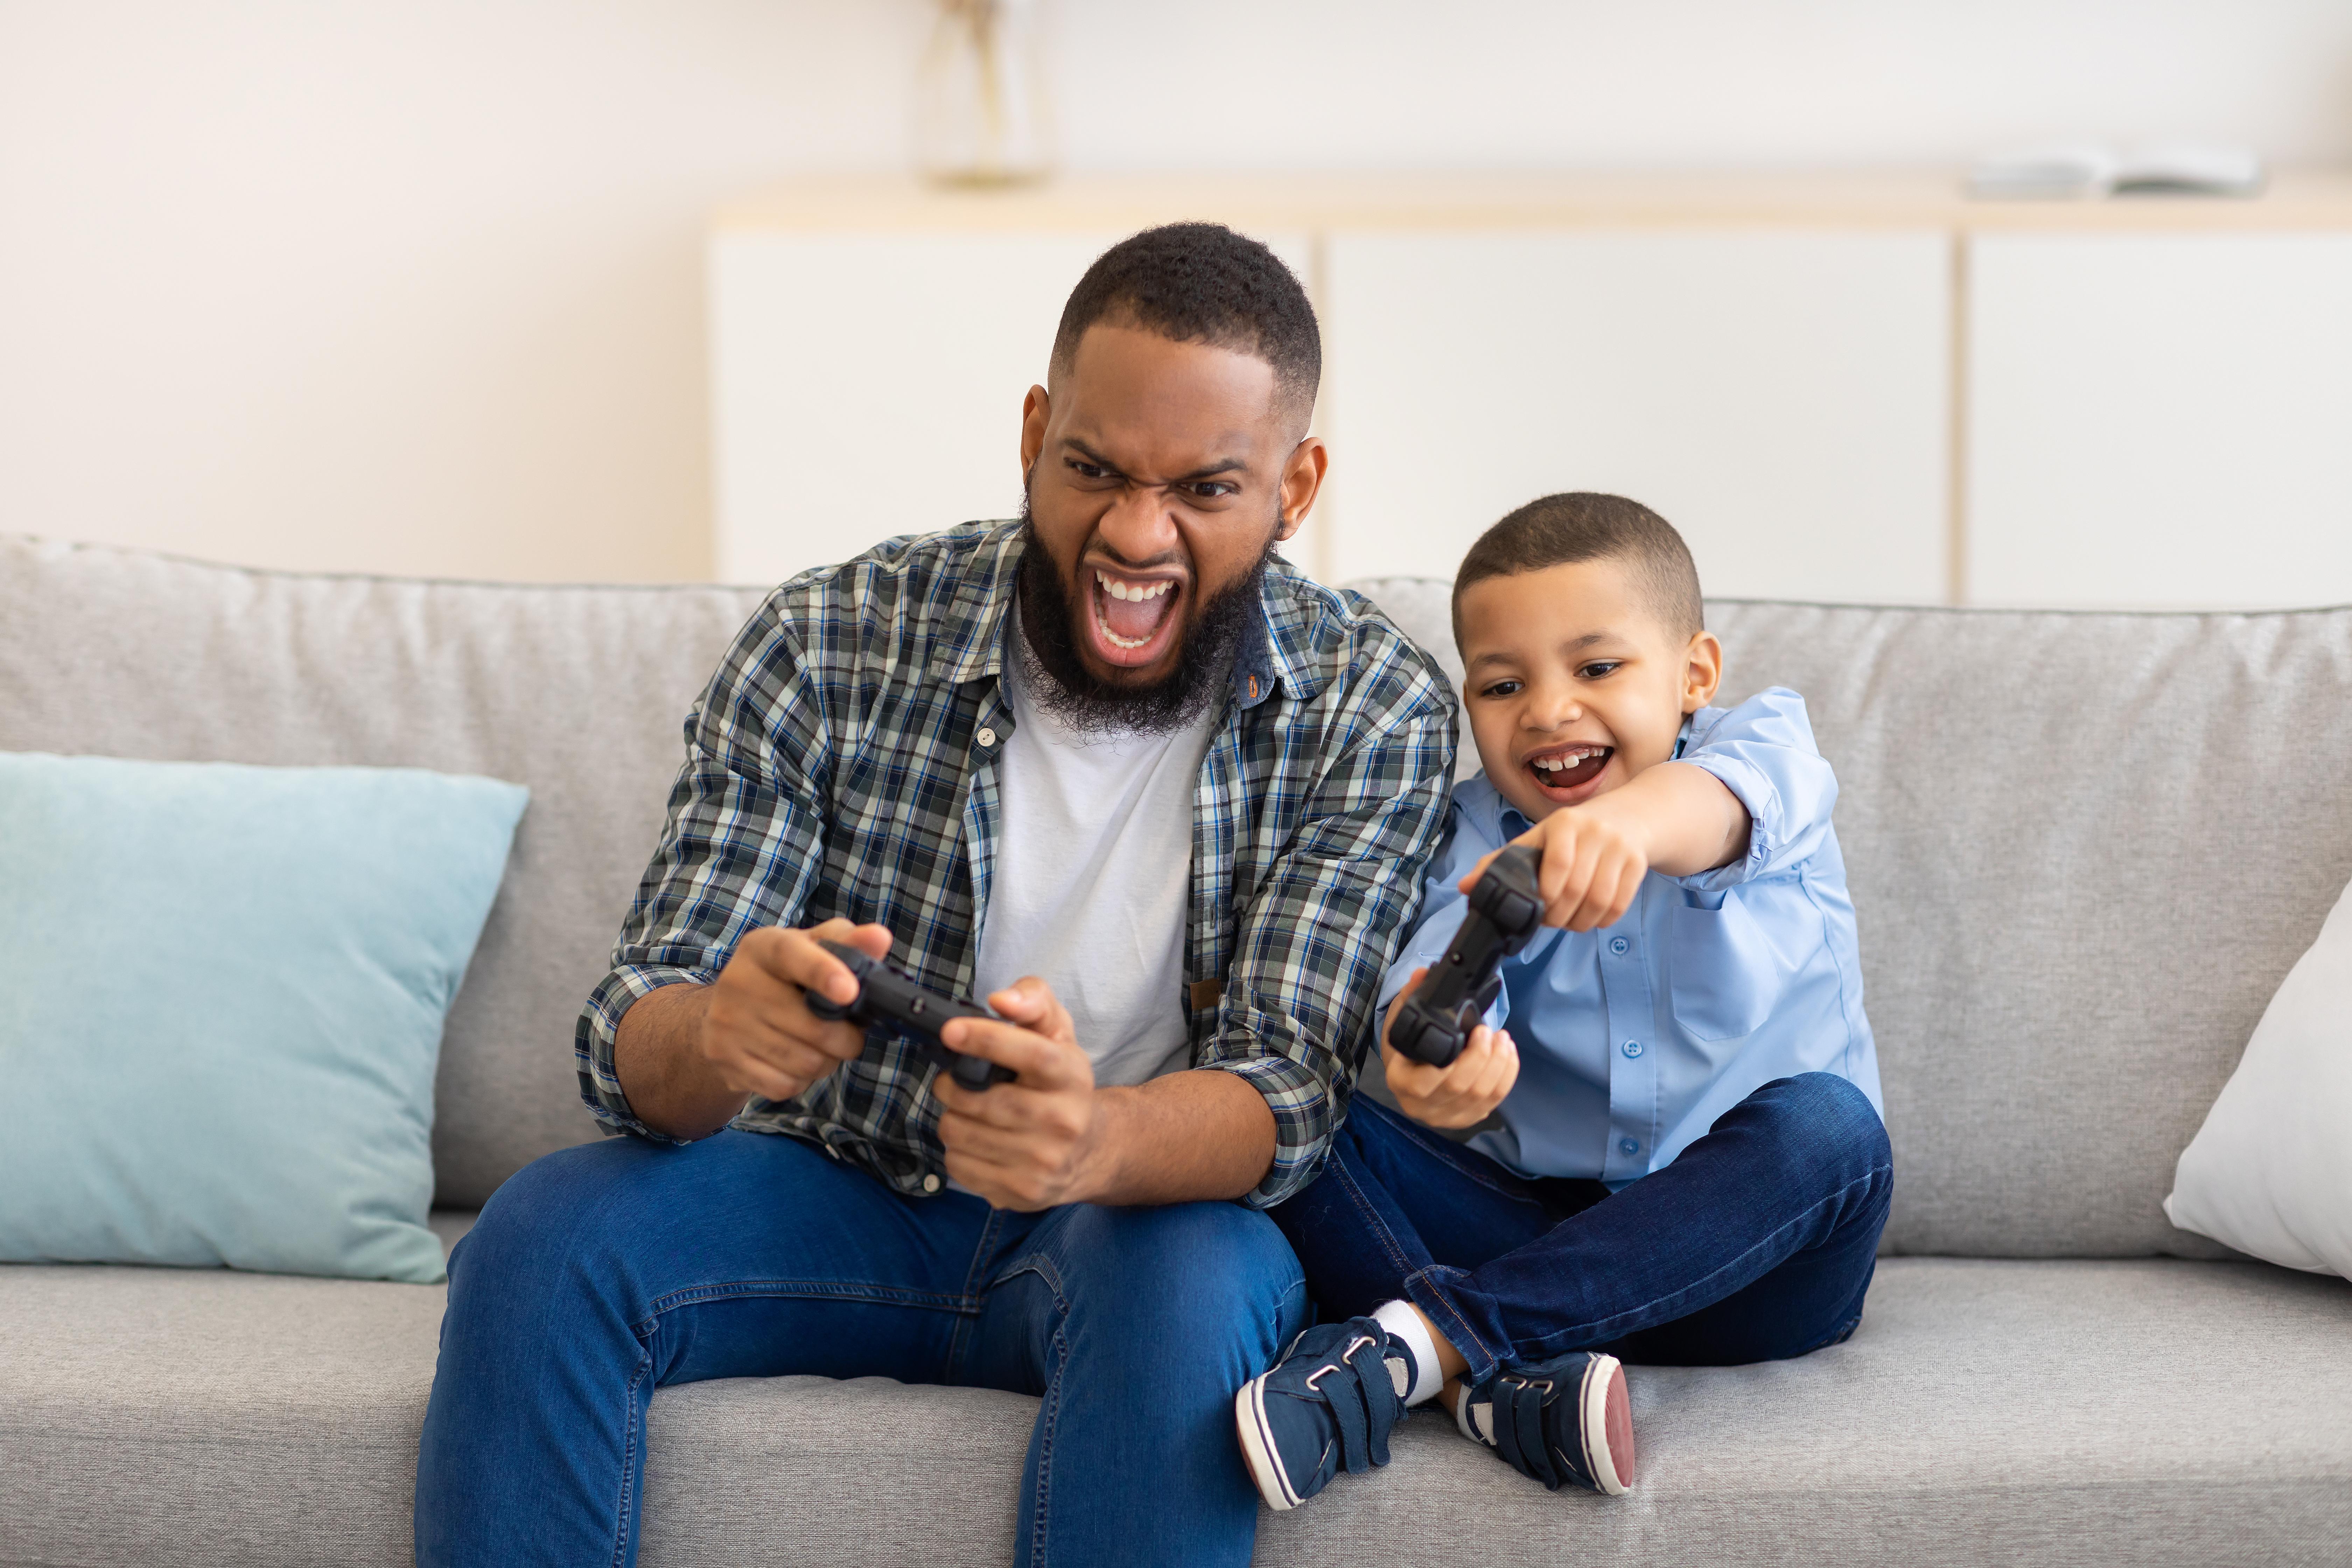 Parent gaming